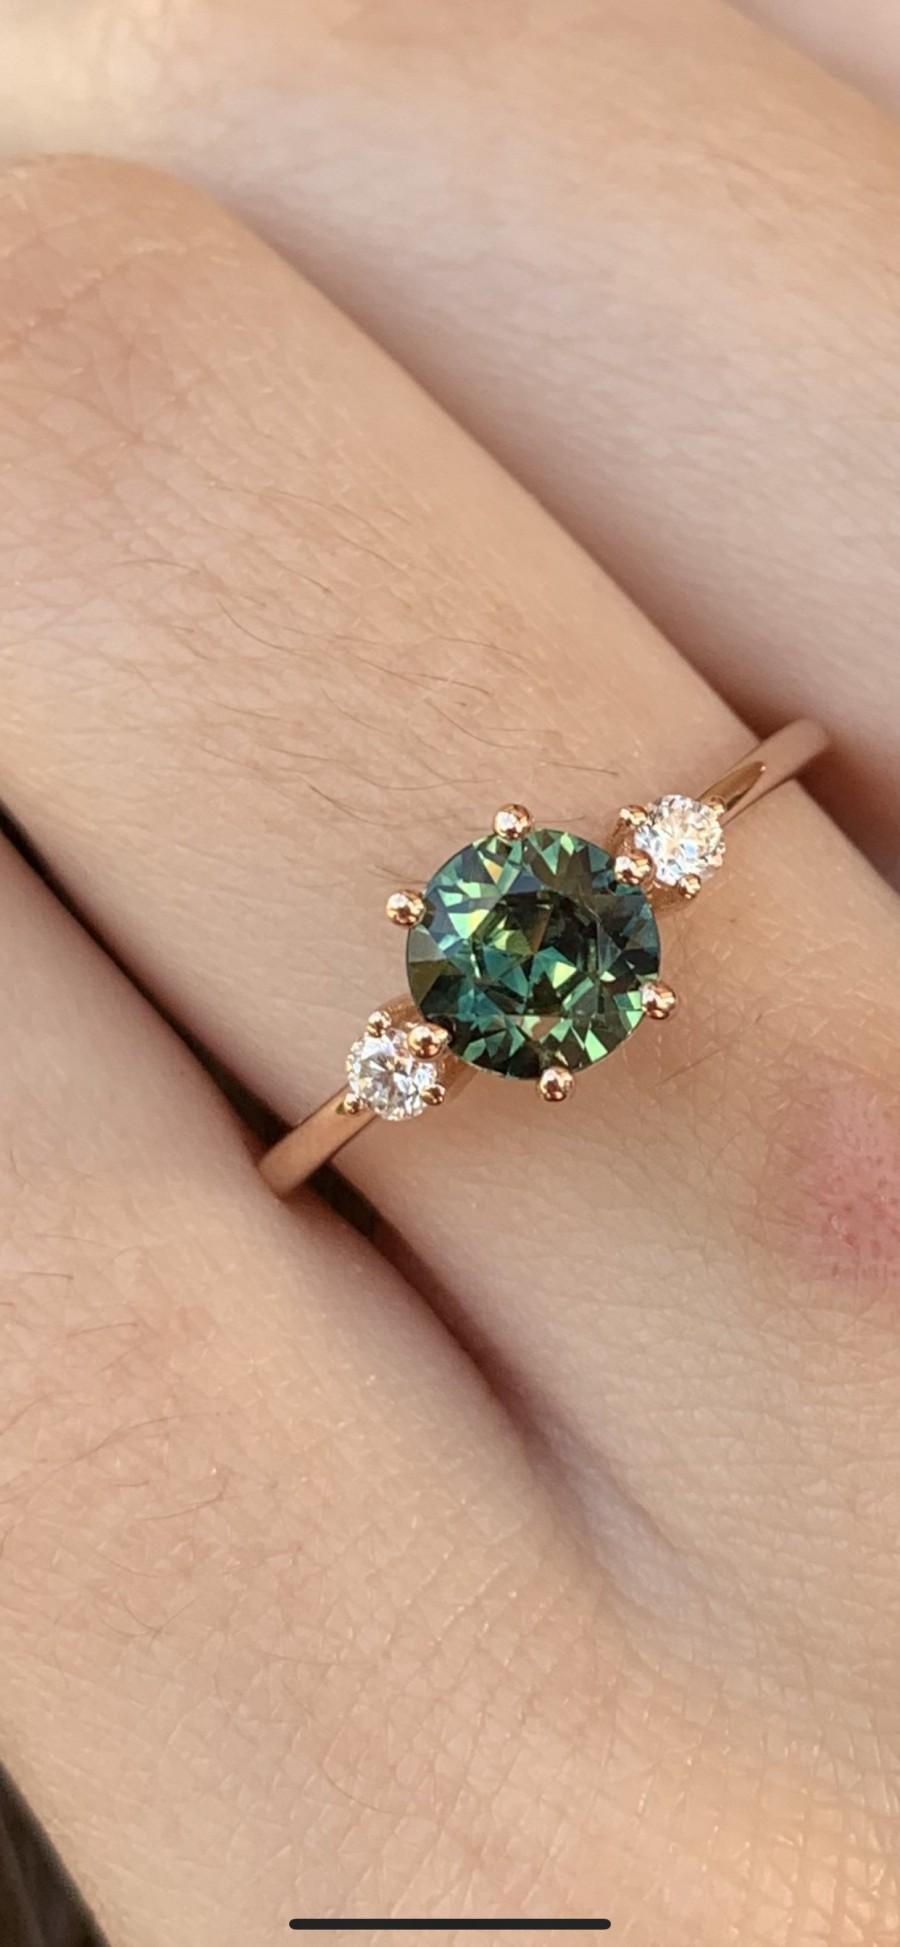 زفاف - Three Stone Teal Sapphire and Diamond Ring, Sapphire Engagement Ring, Parti Sapphire and Diamond Ring - Aviana